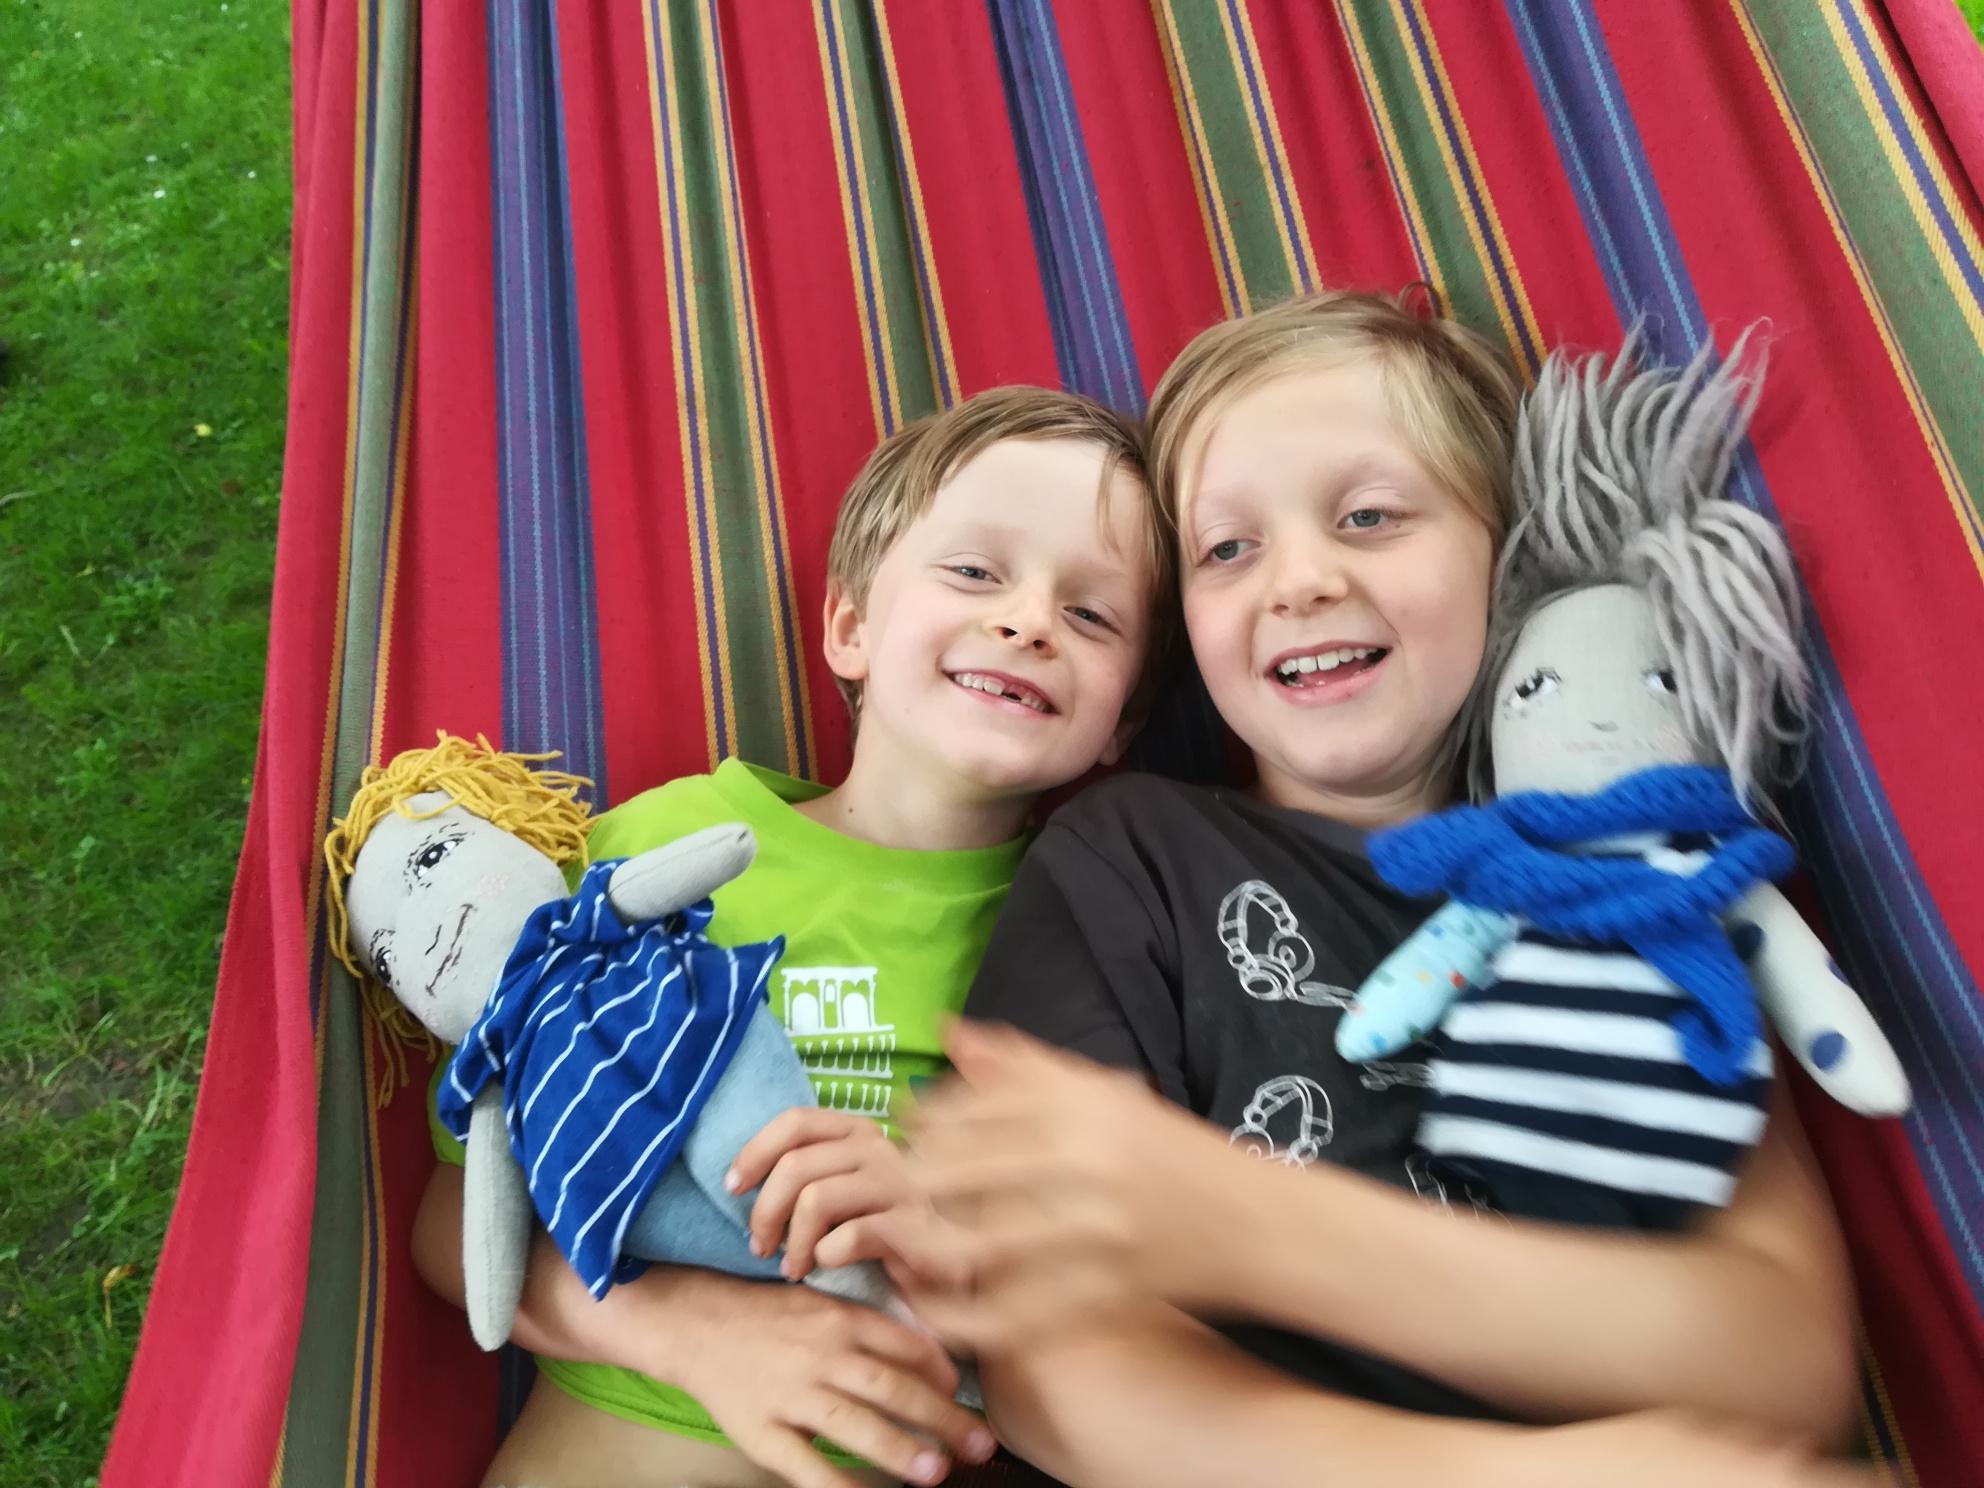 Maty and Vojta in their hammock